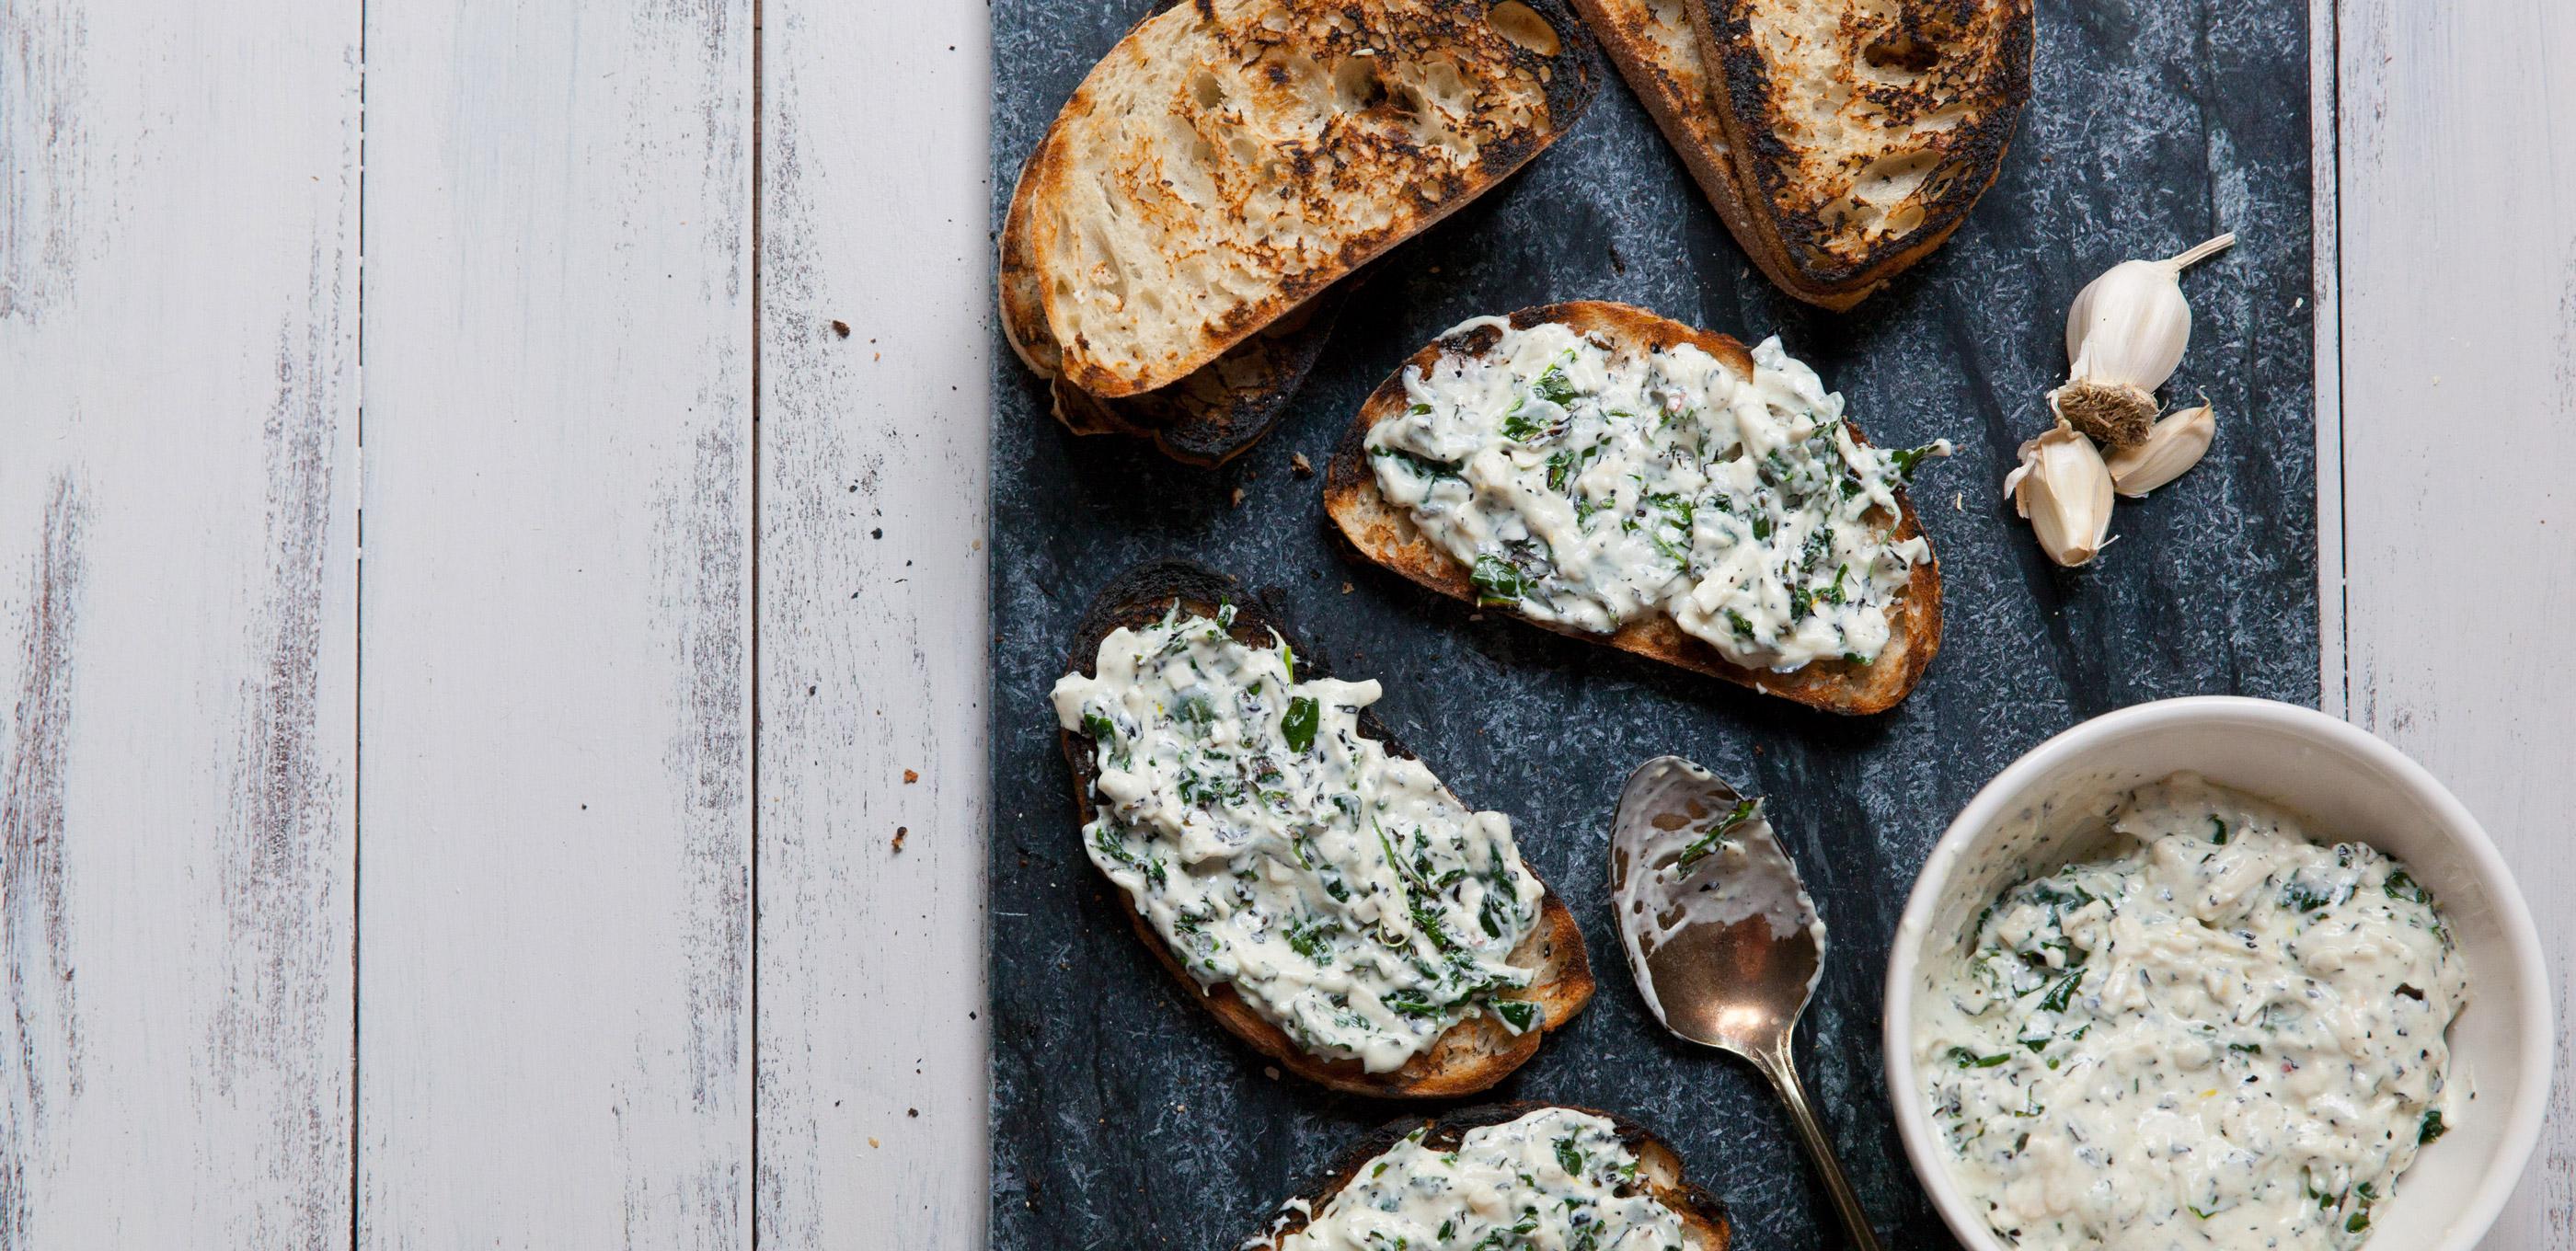 What's better than avocado toast? Creamy kale toast, obvi.